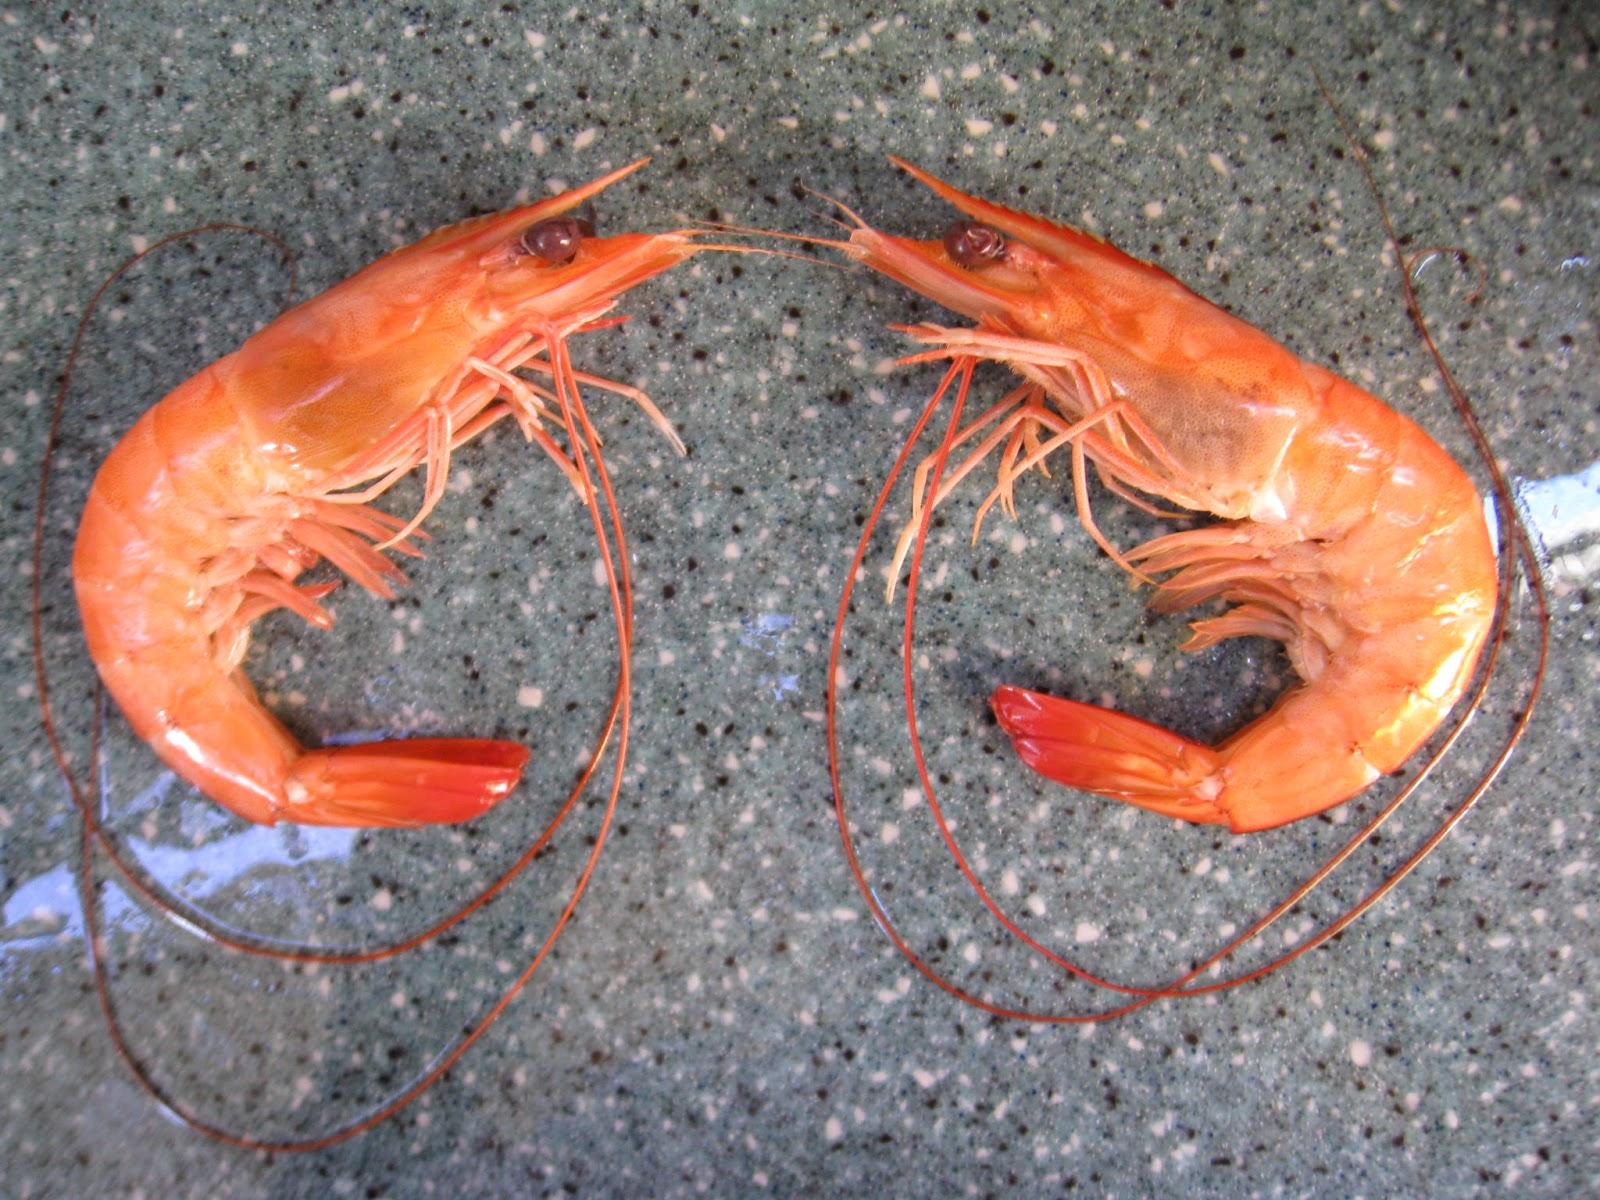 Cinnabarbarians: Moorea - A Visit To The Shrimp Farm